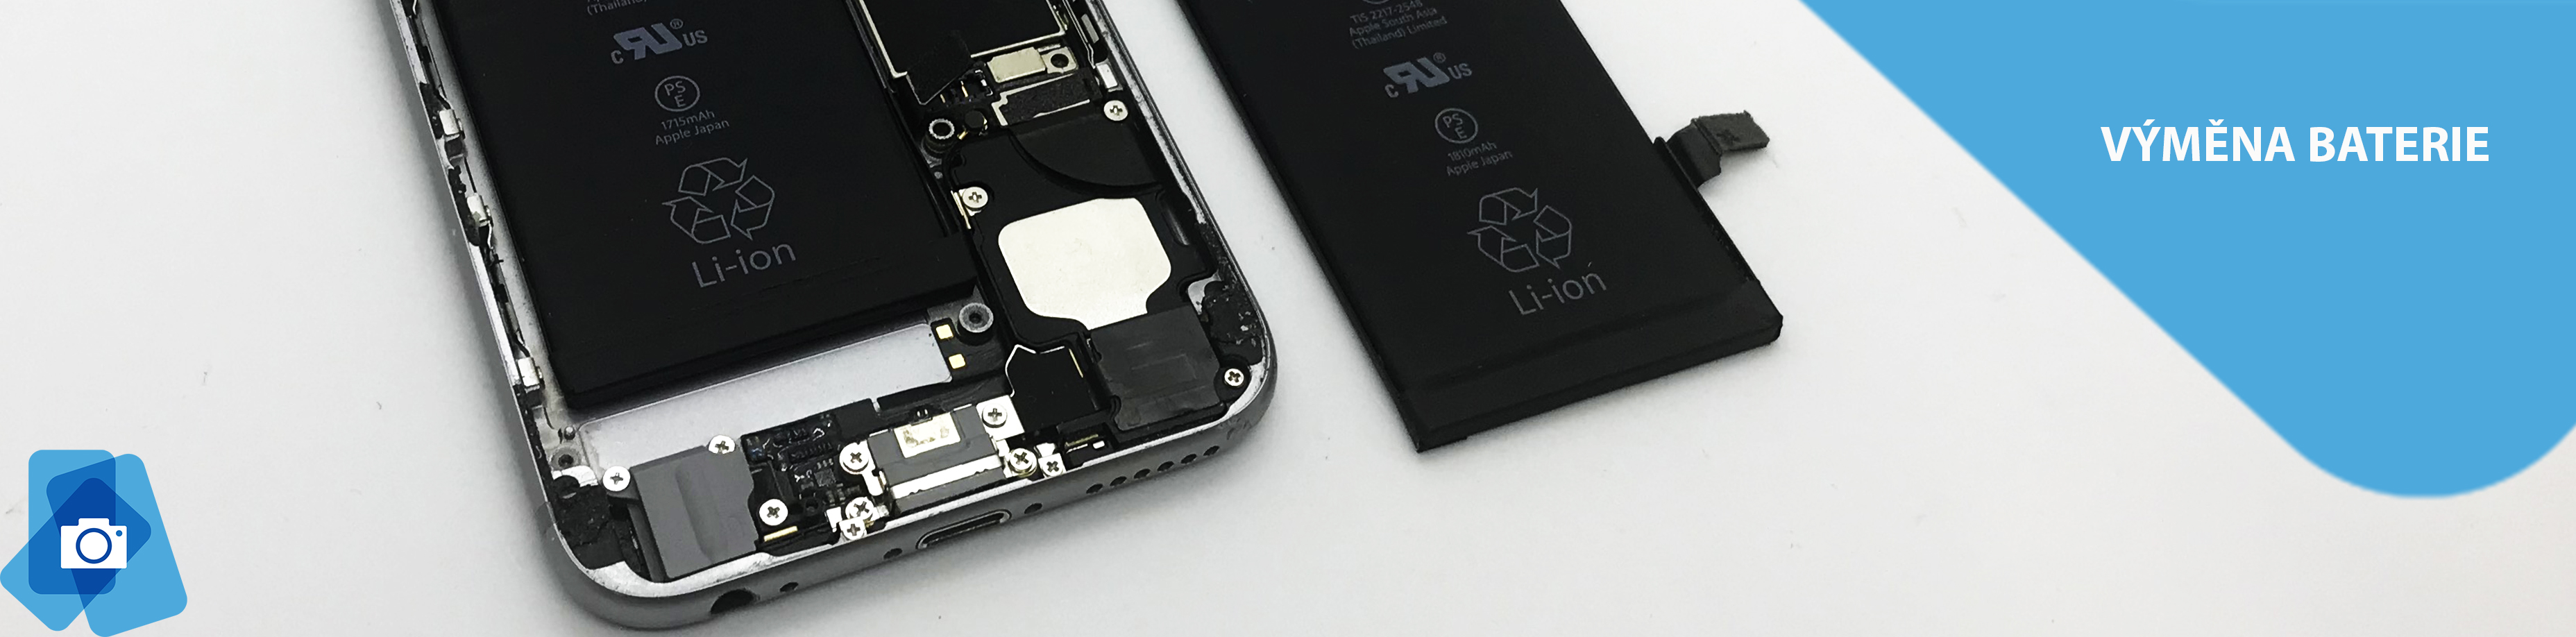 Výměna Baterie iPhone Praha 5